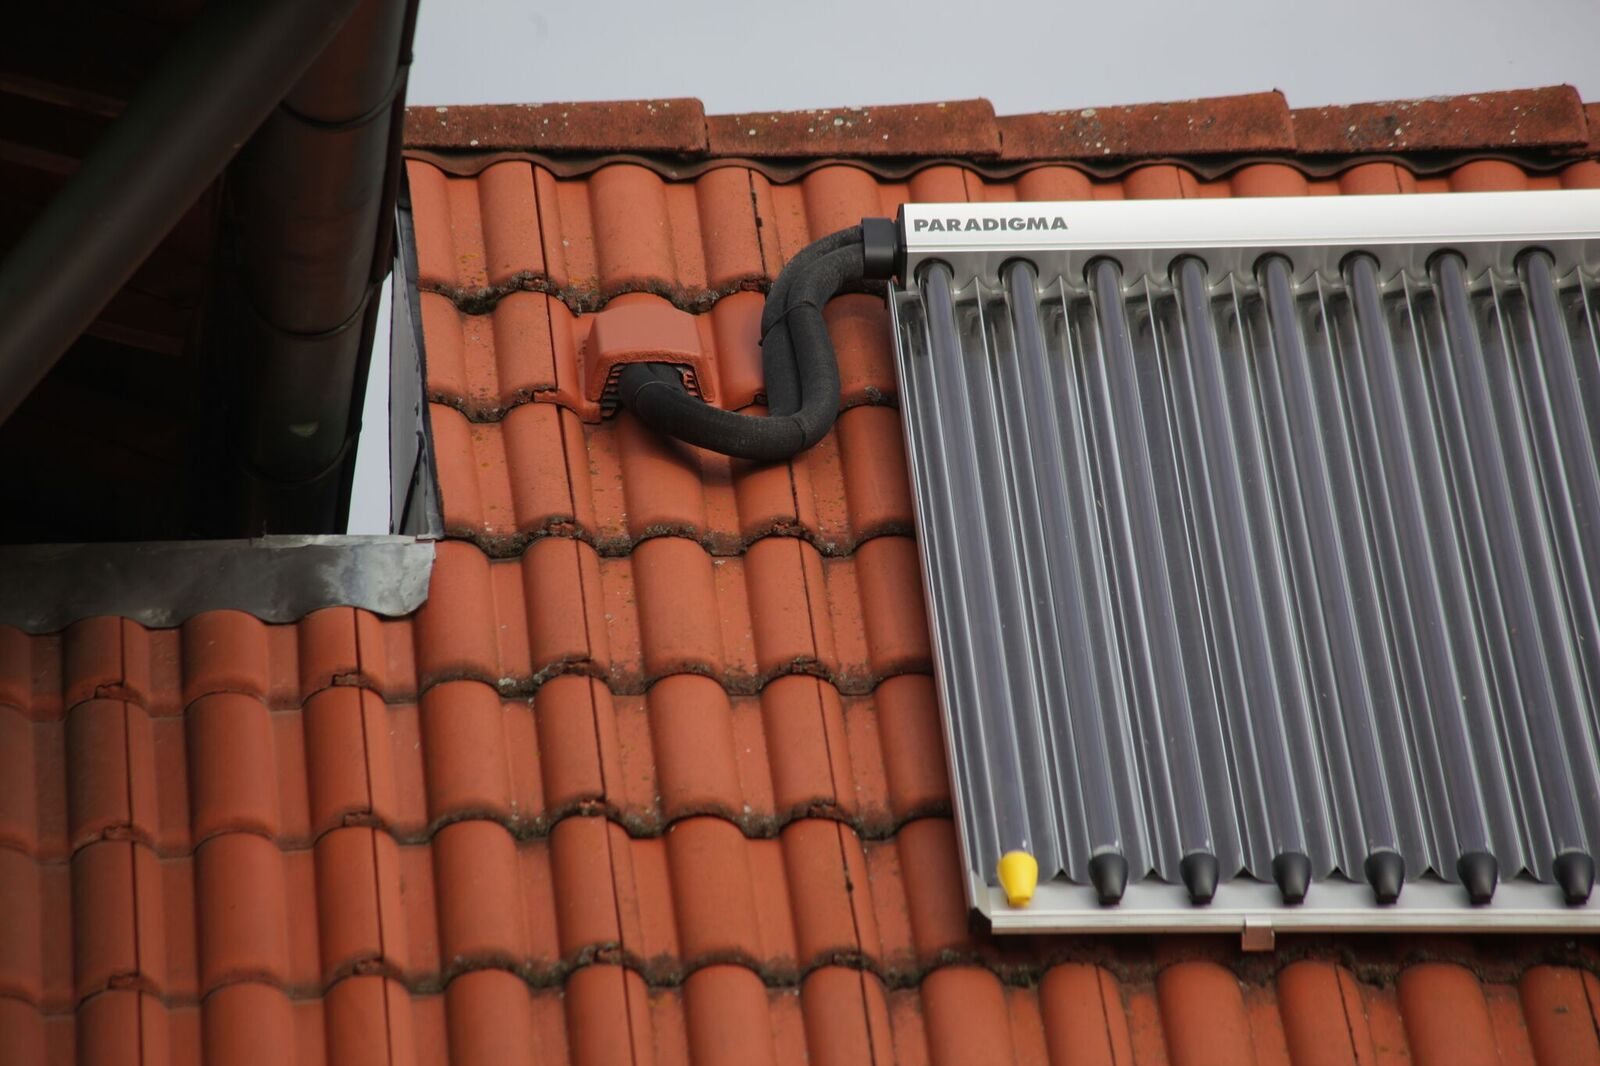 Solarthermie-Kollektor Detail Dachinstallation Projekt des Monats 2 November 2017 Hofer Haustechnik GmbH